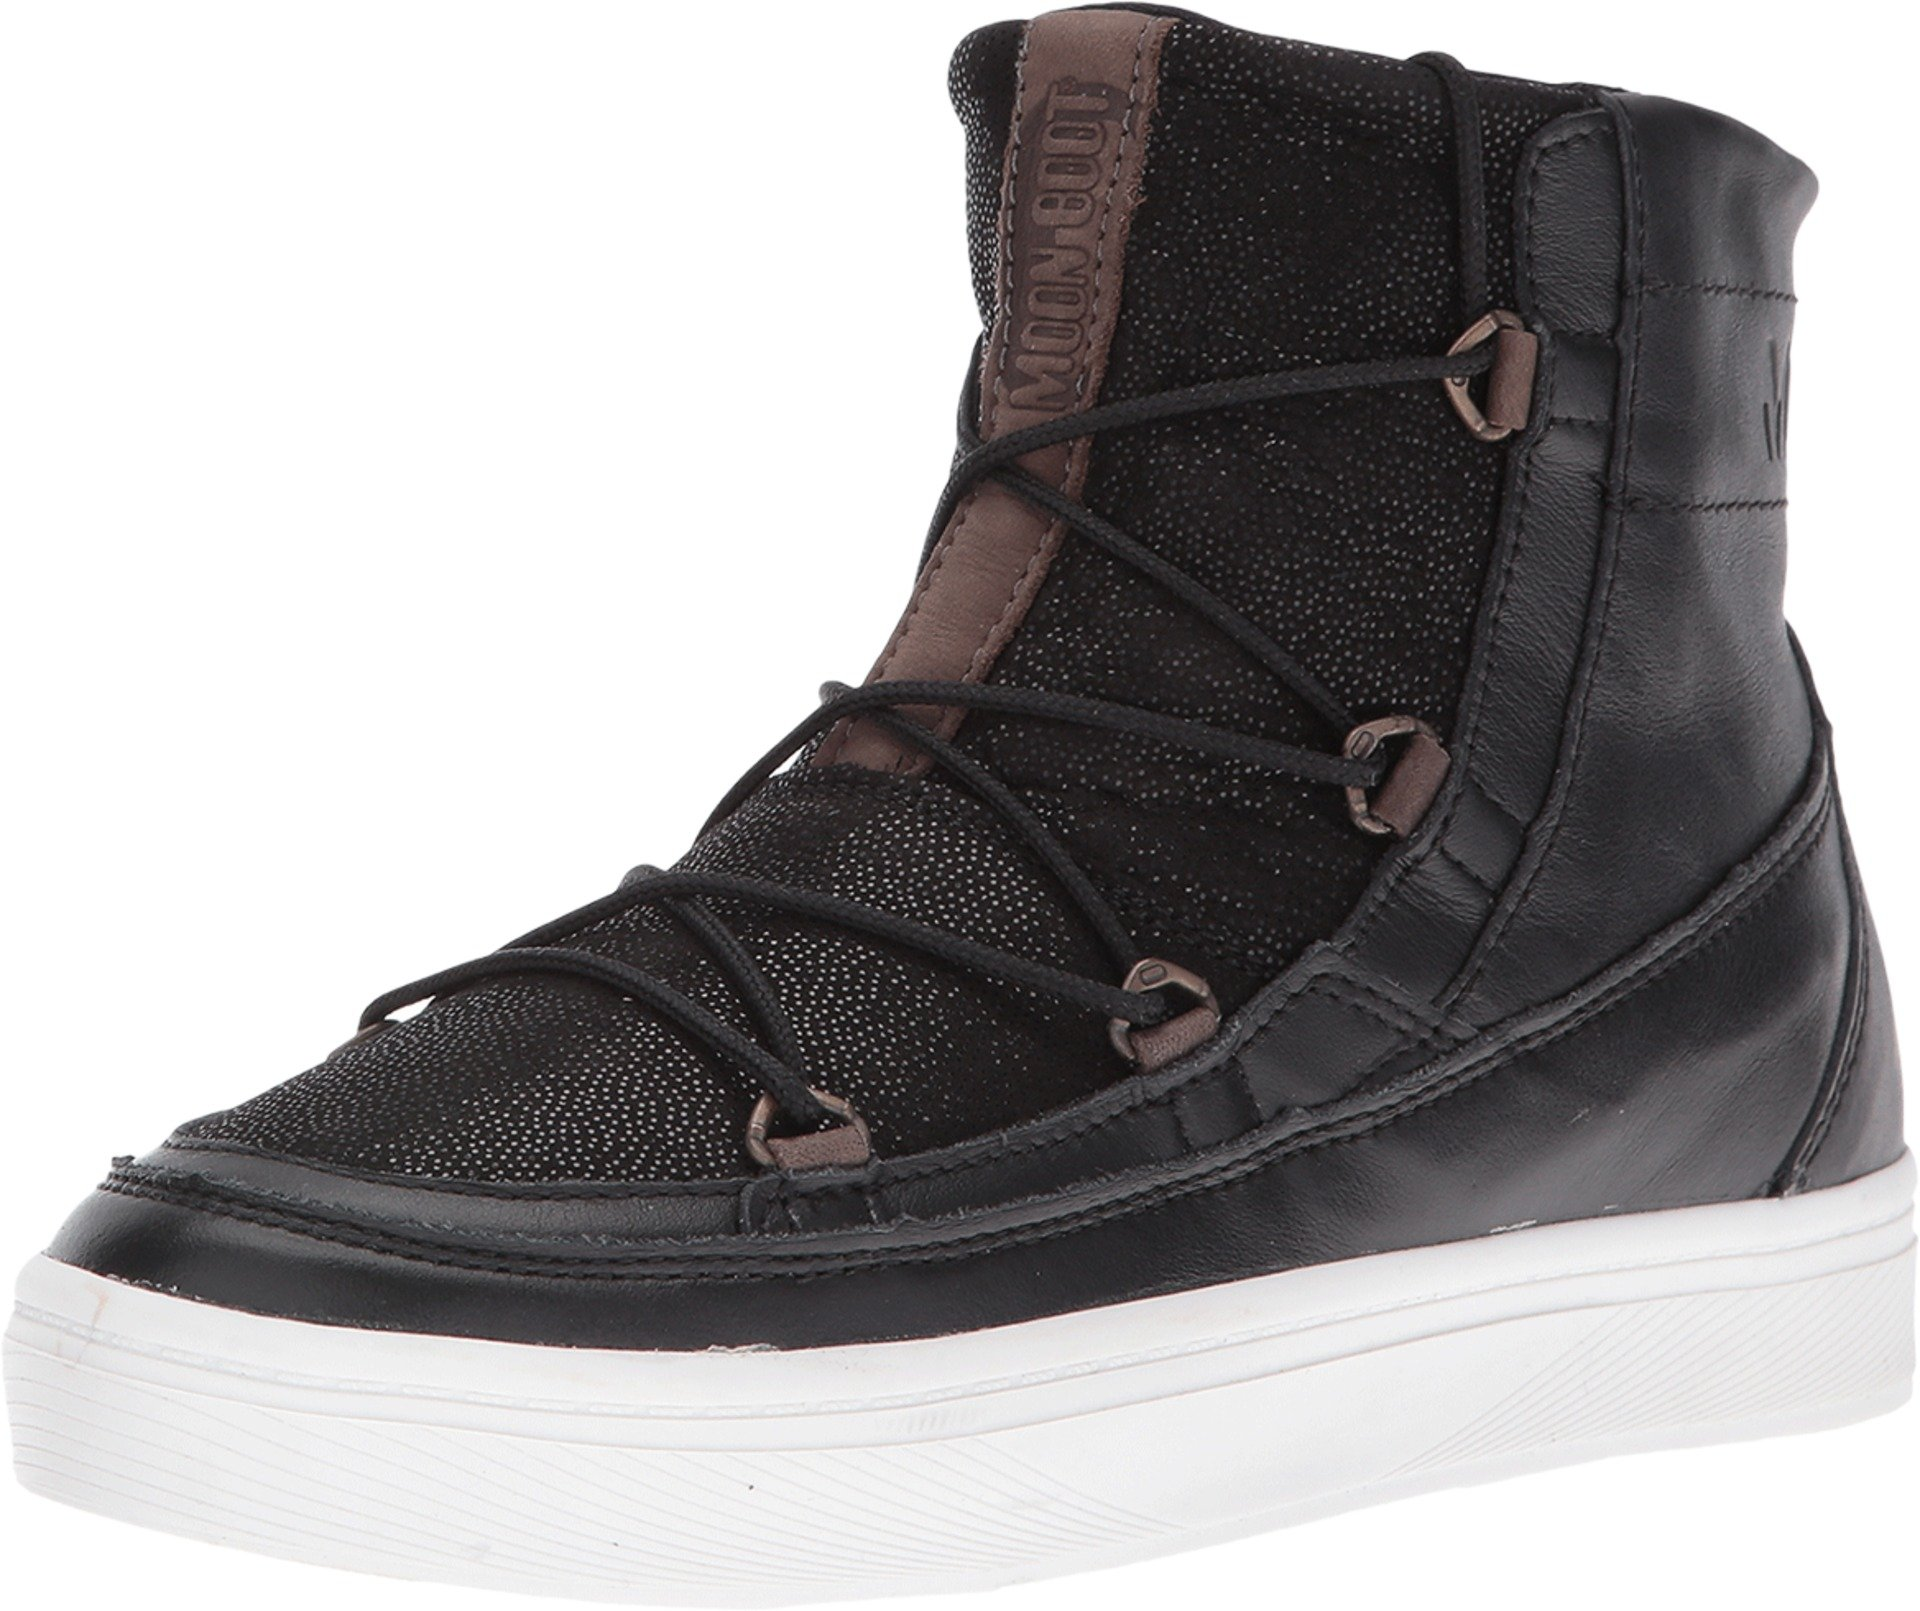 Tecnica Unisex Moon Boot Vega Lux Black Sneaker 40 (US Men's 7.5, US Women's 9) Medium